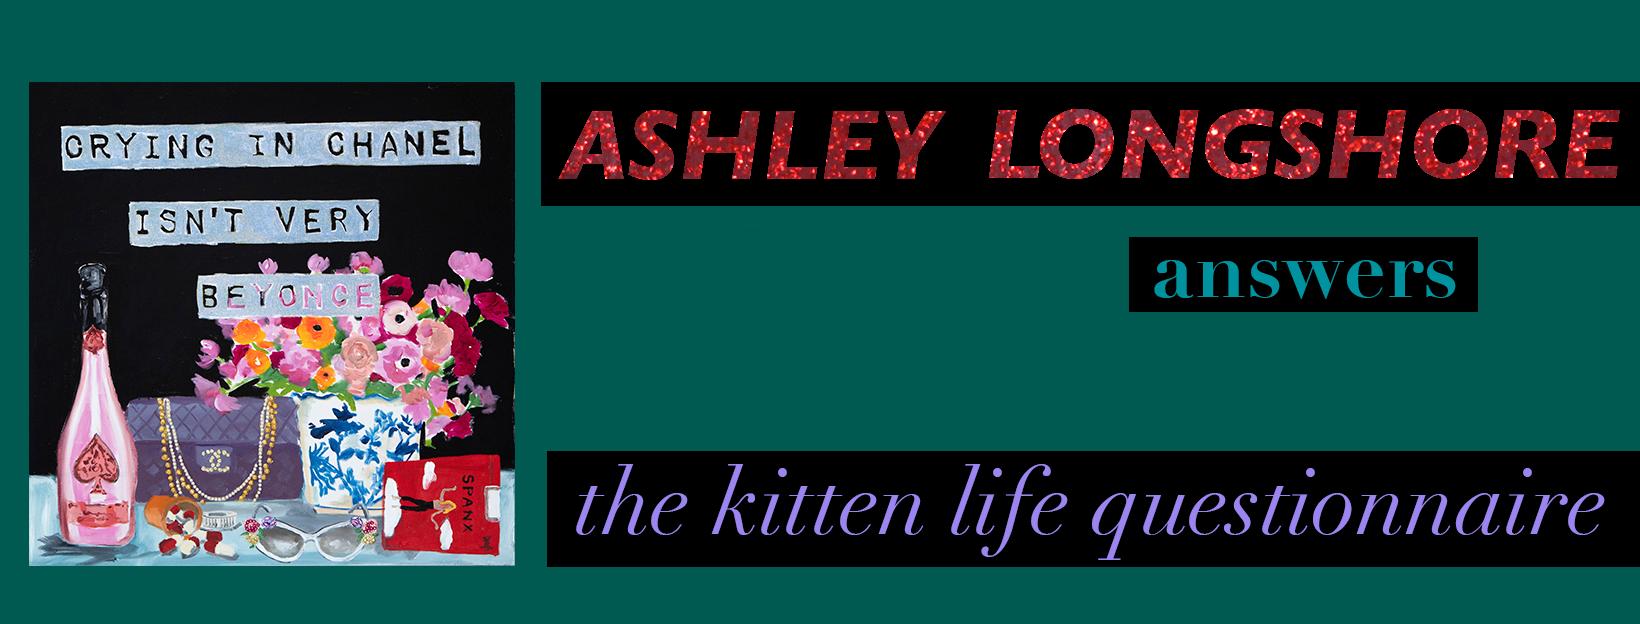 ashley longshore, feminism, women's march on washington, andy warhol